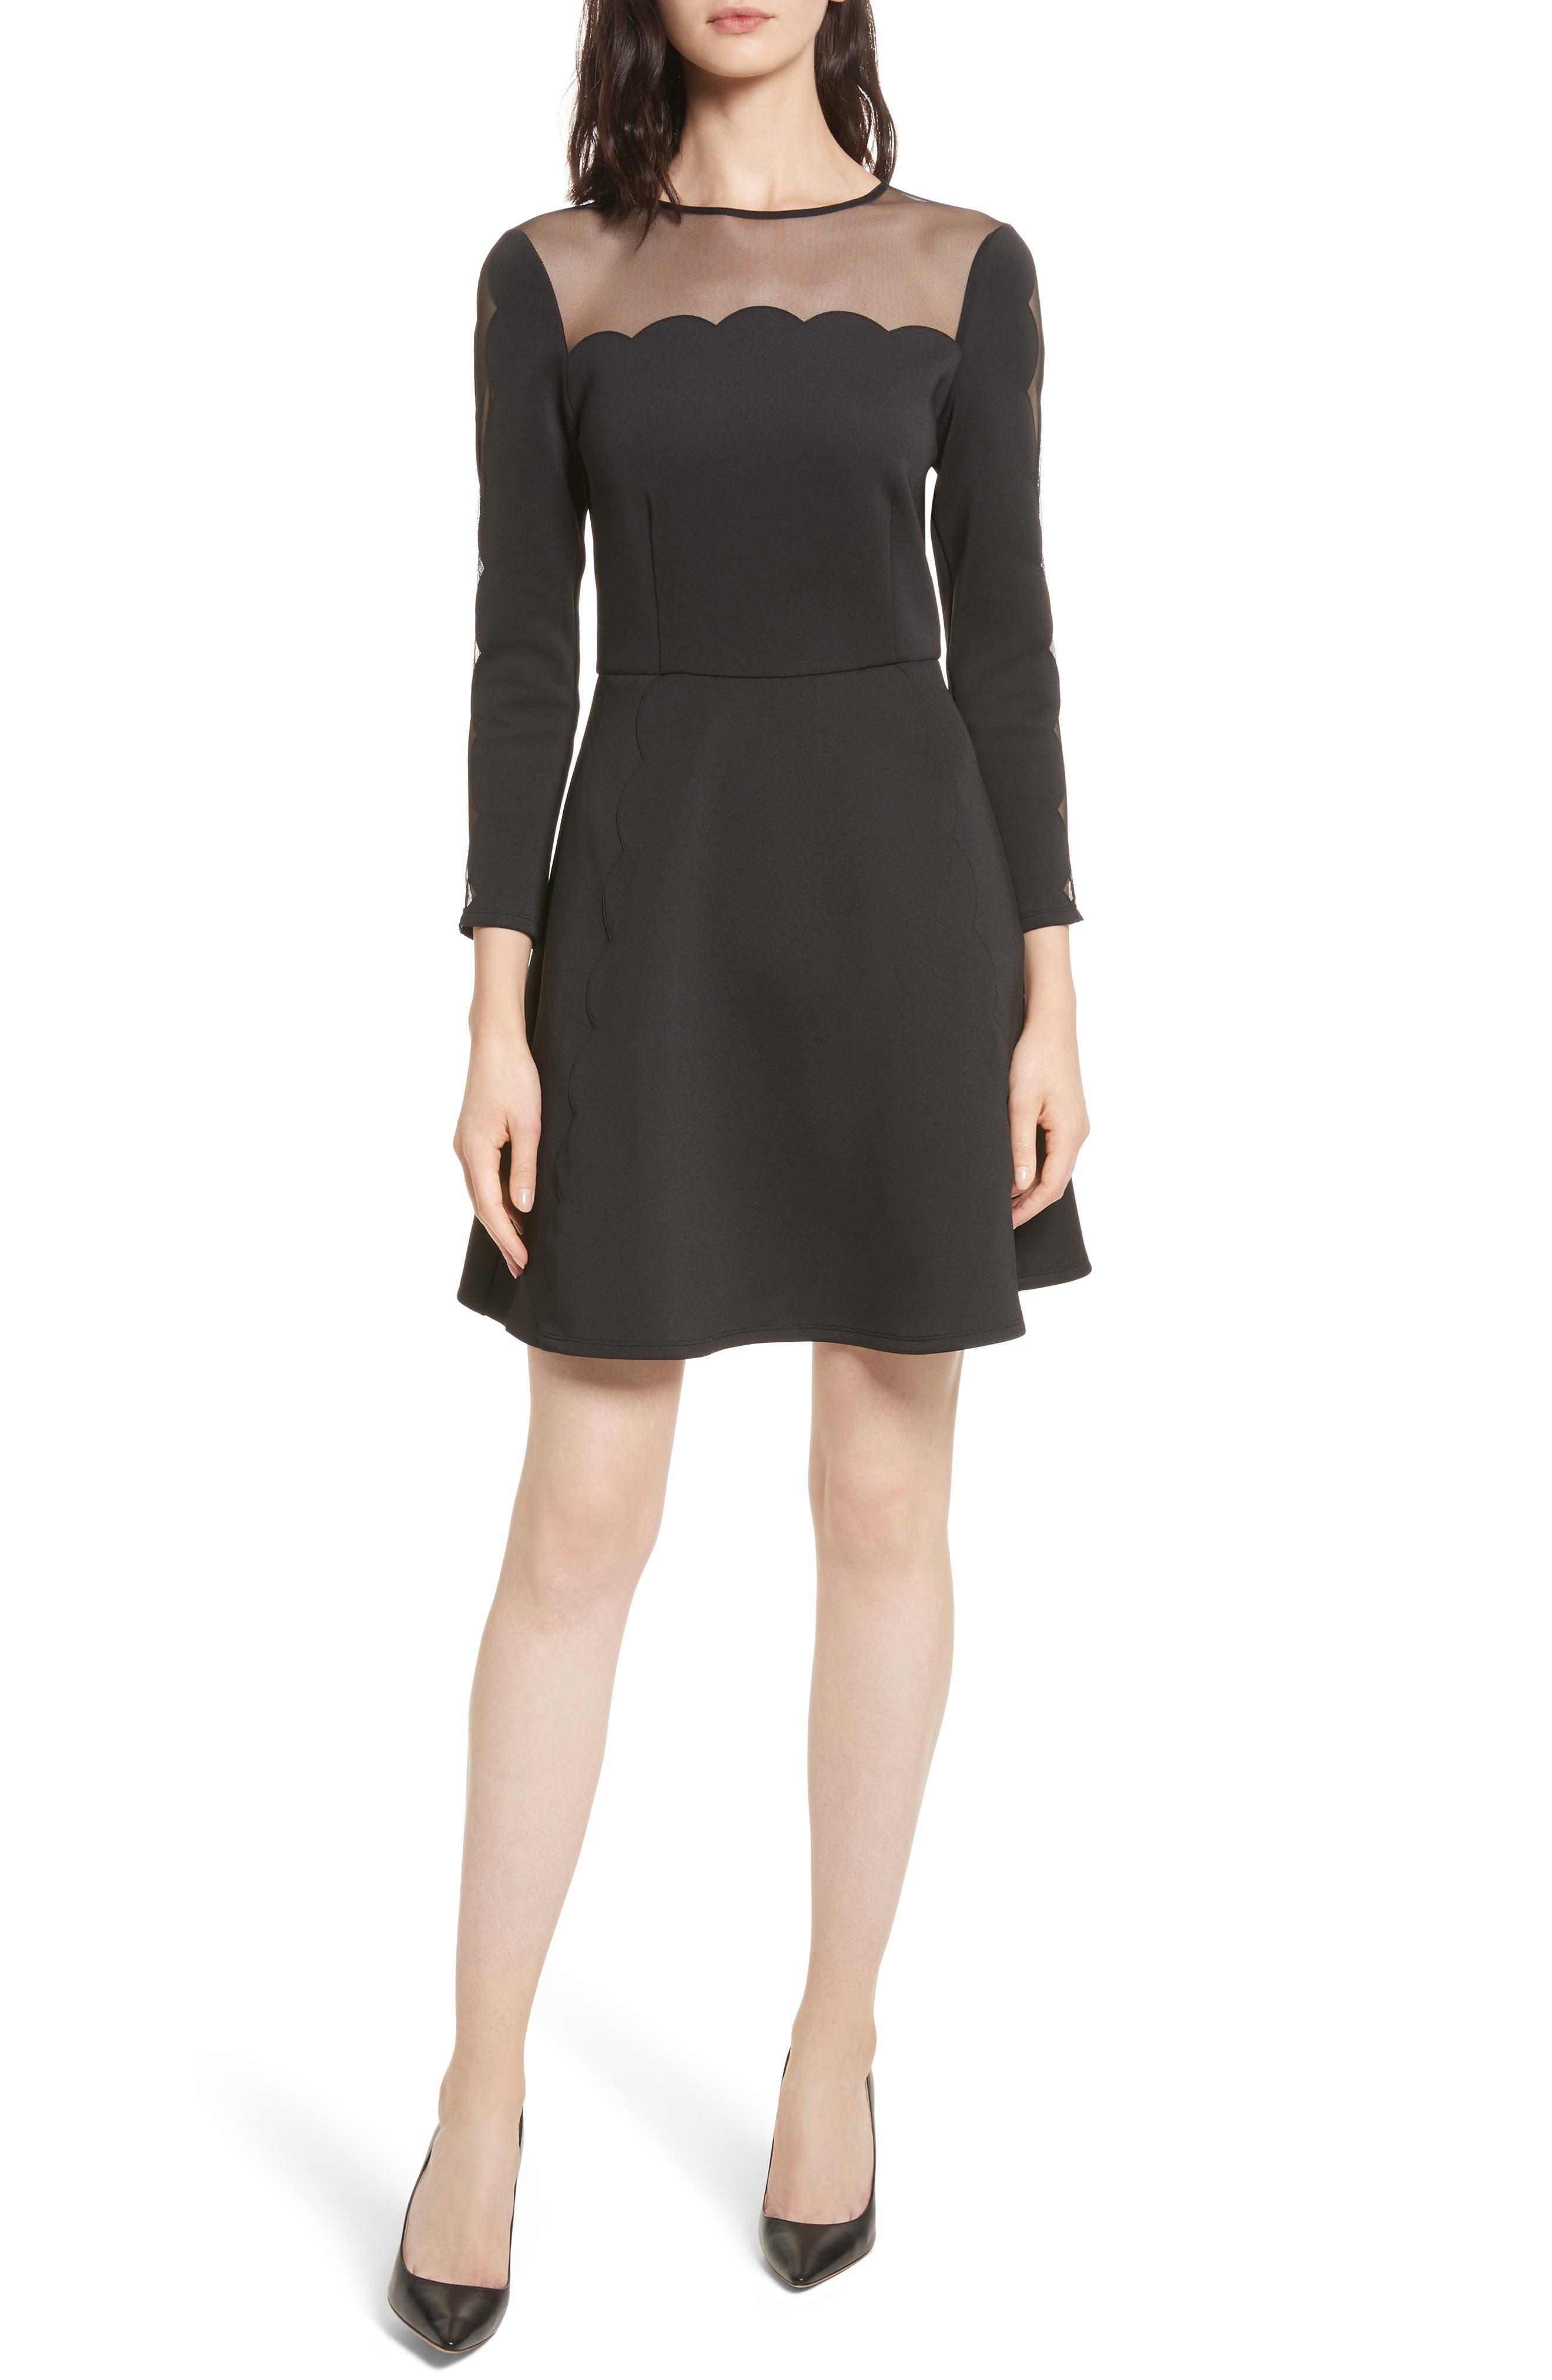 Kikoh Mesh Panel Skater Dress,                         Main,                         color, Black